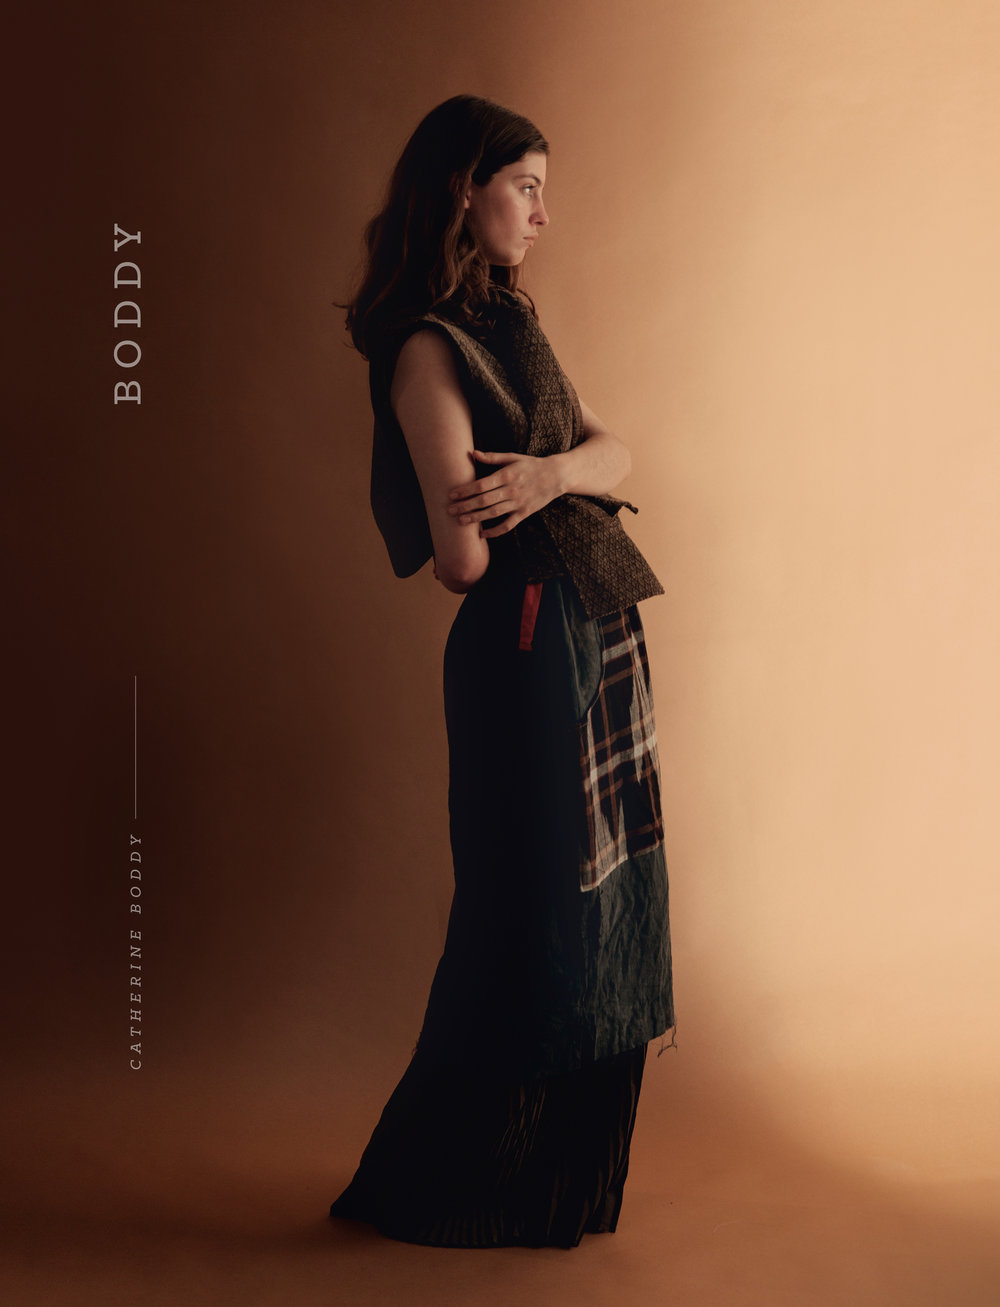 tbfieulaine-Catherine-Boddy-Campaign-web-6.jpg